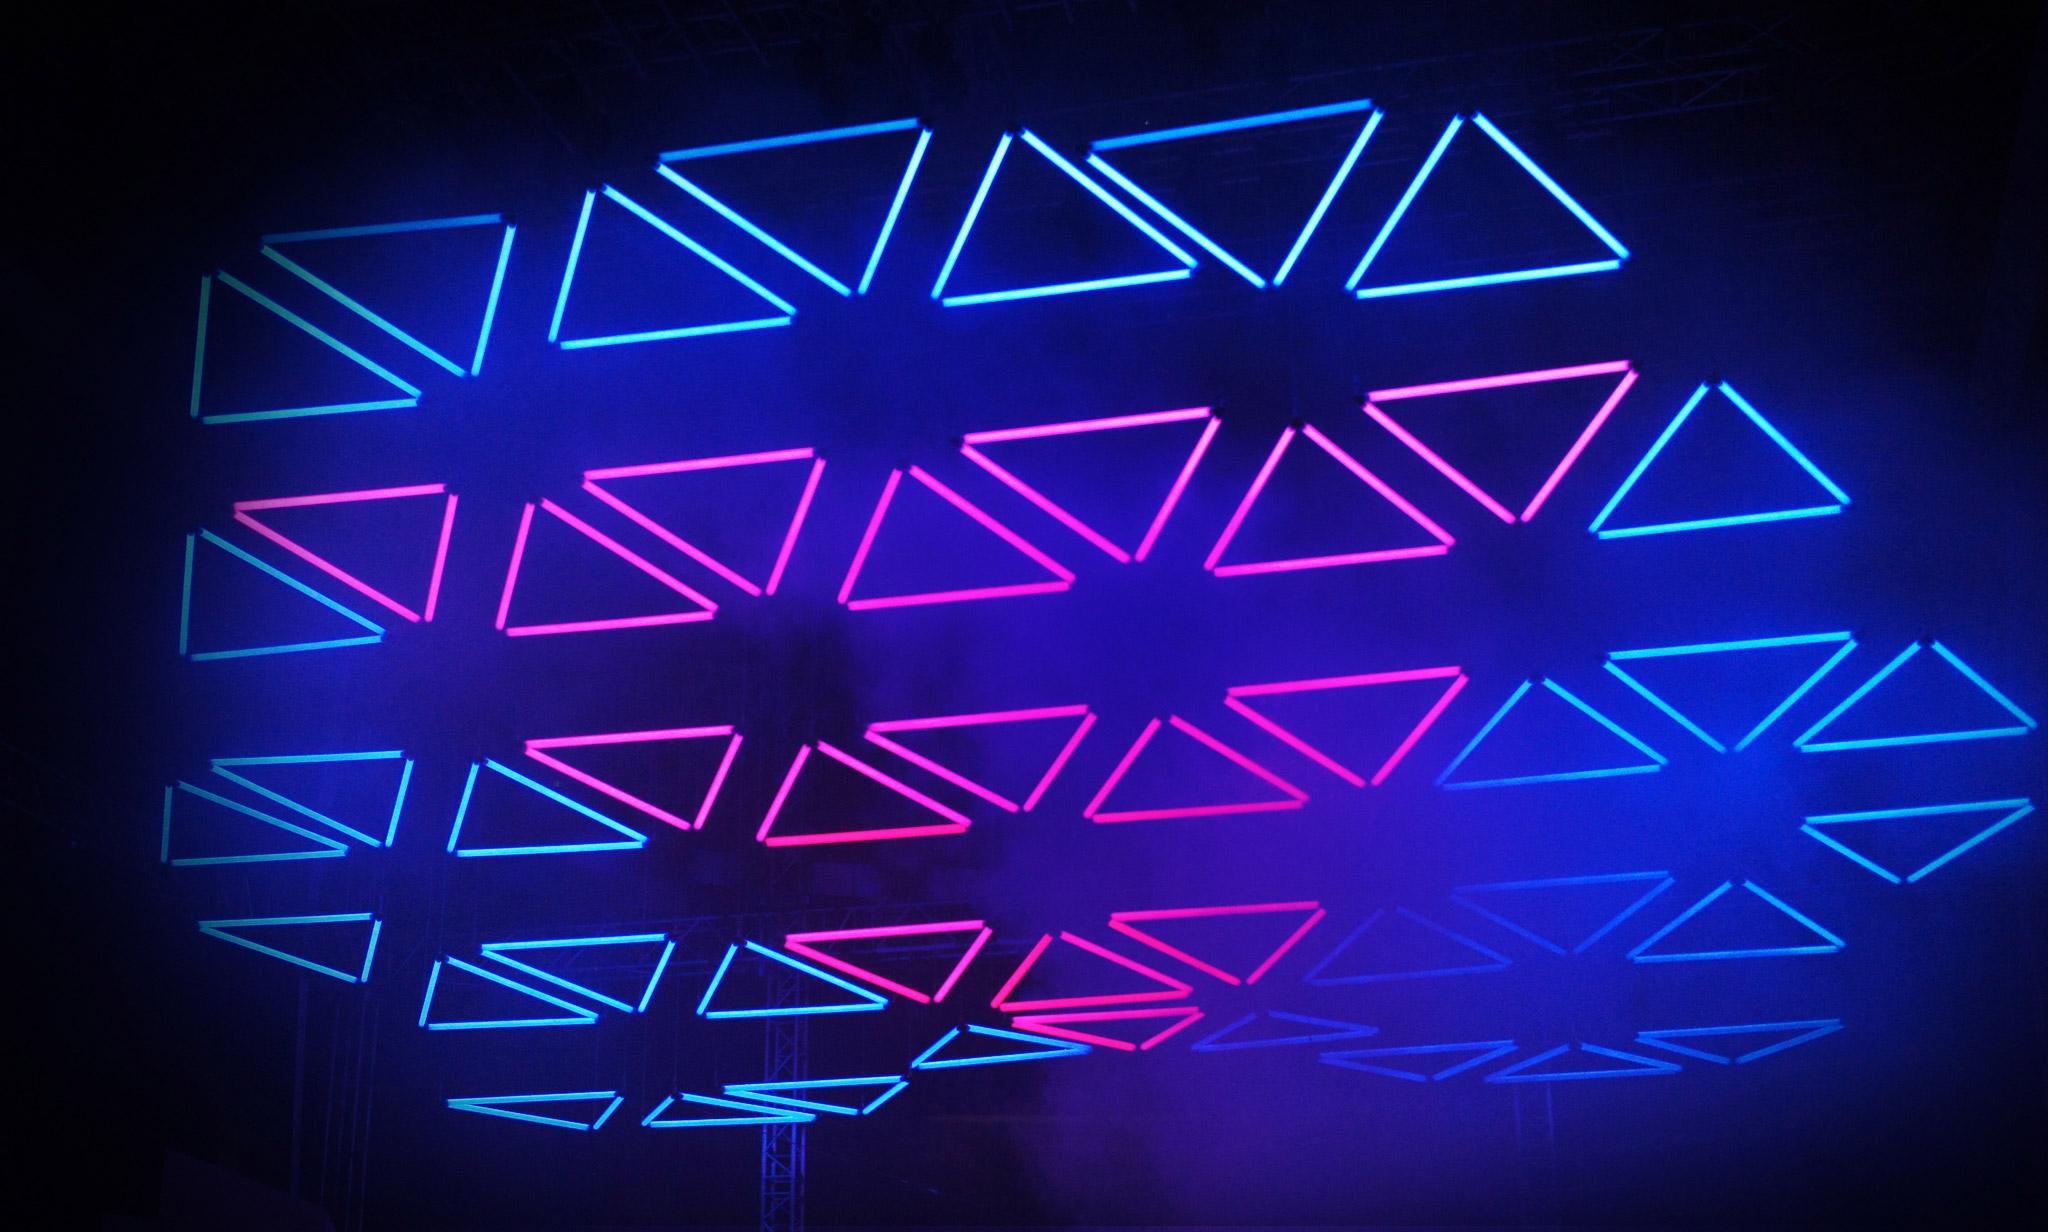 KINETIC LIGHTS - THE ORIGINAL DMX Power Winch System